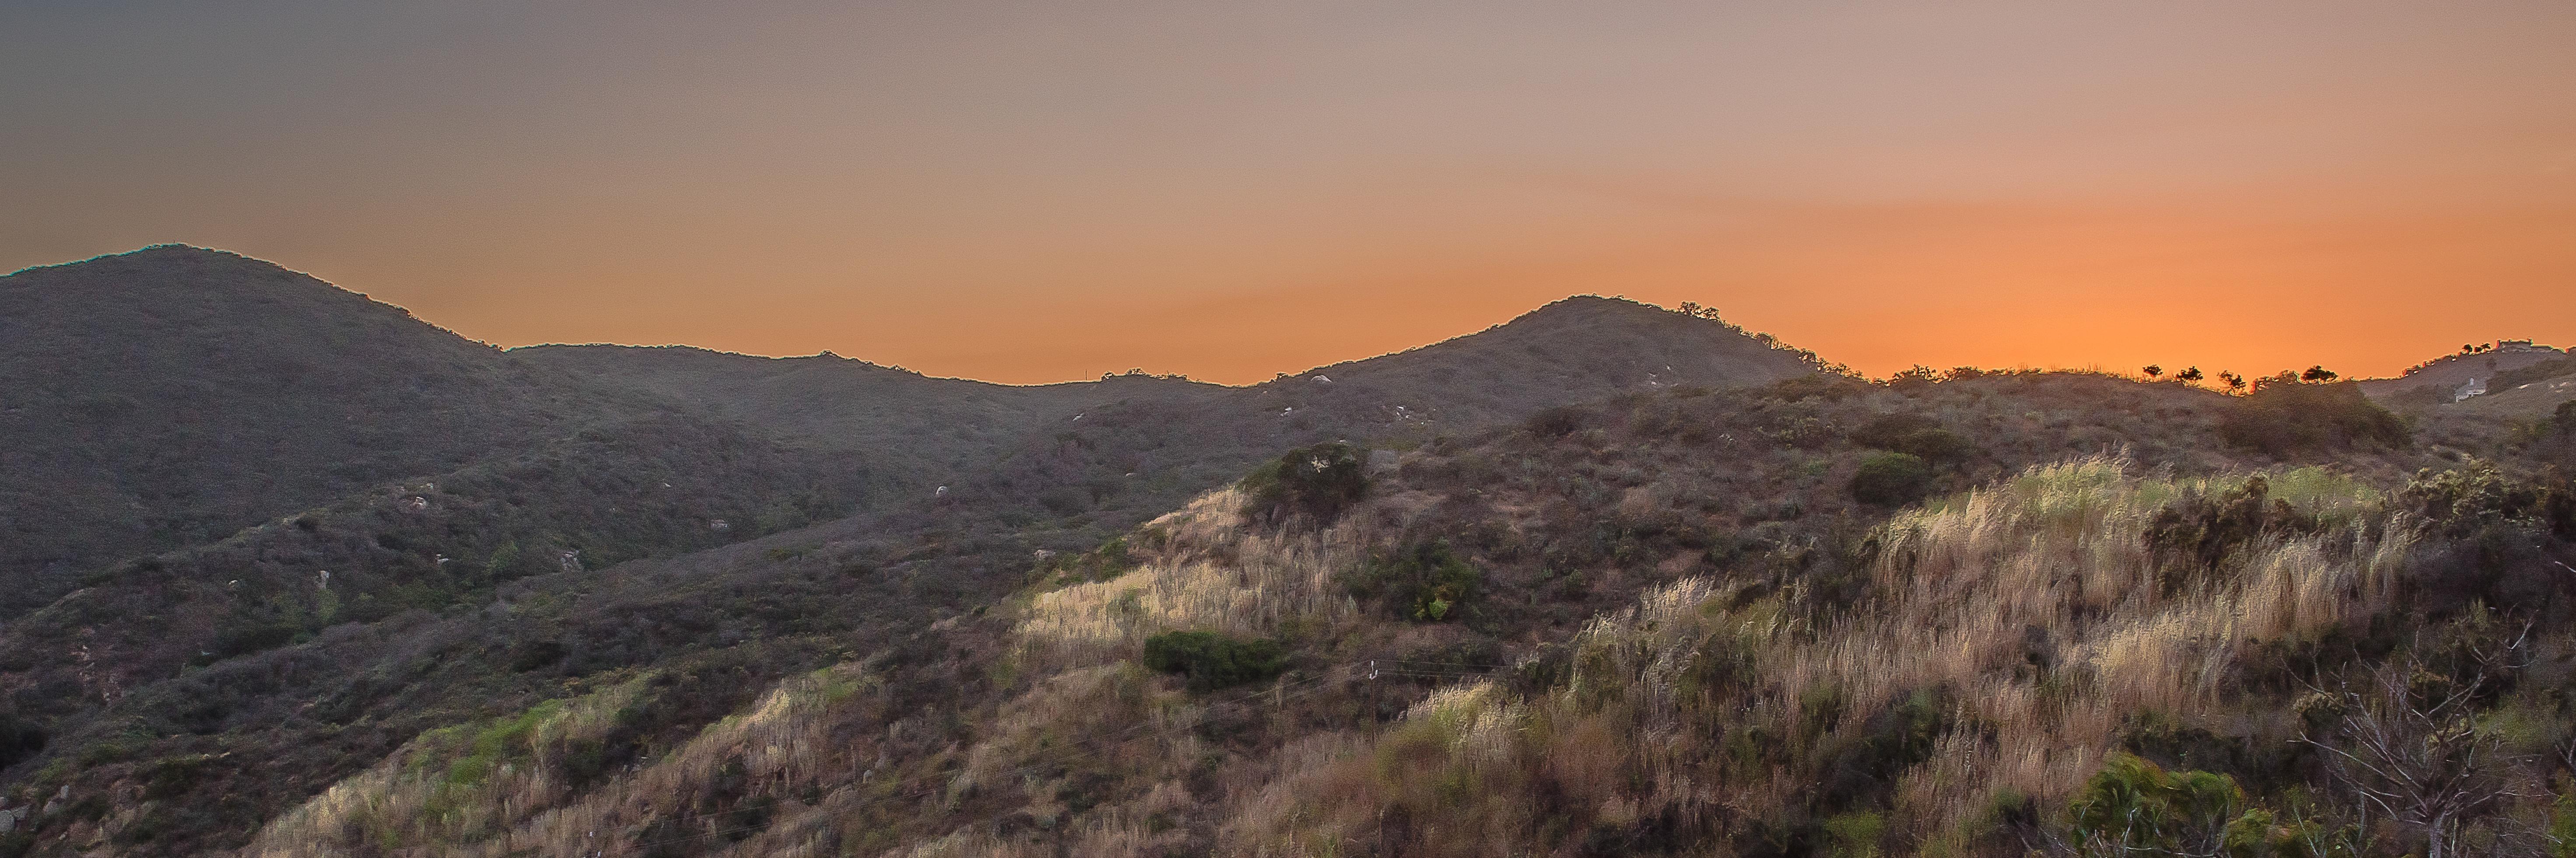 Southern California landscape.